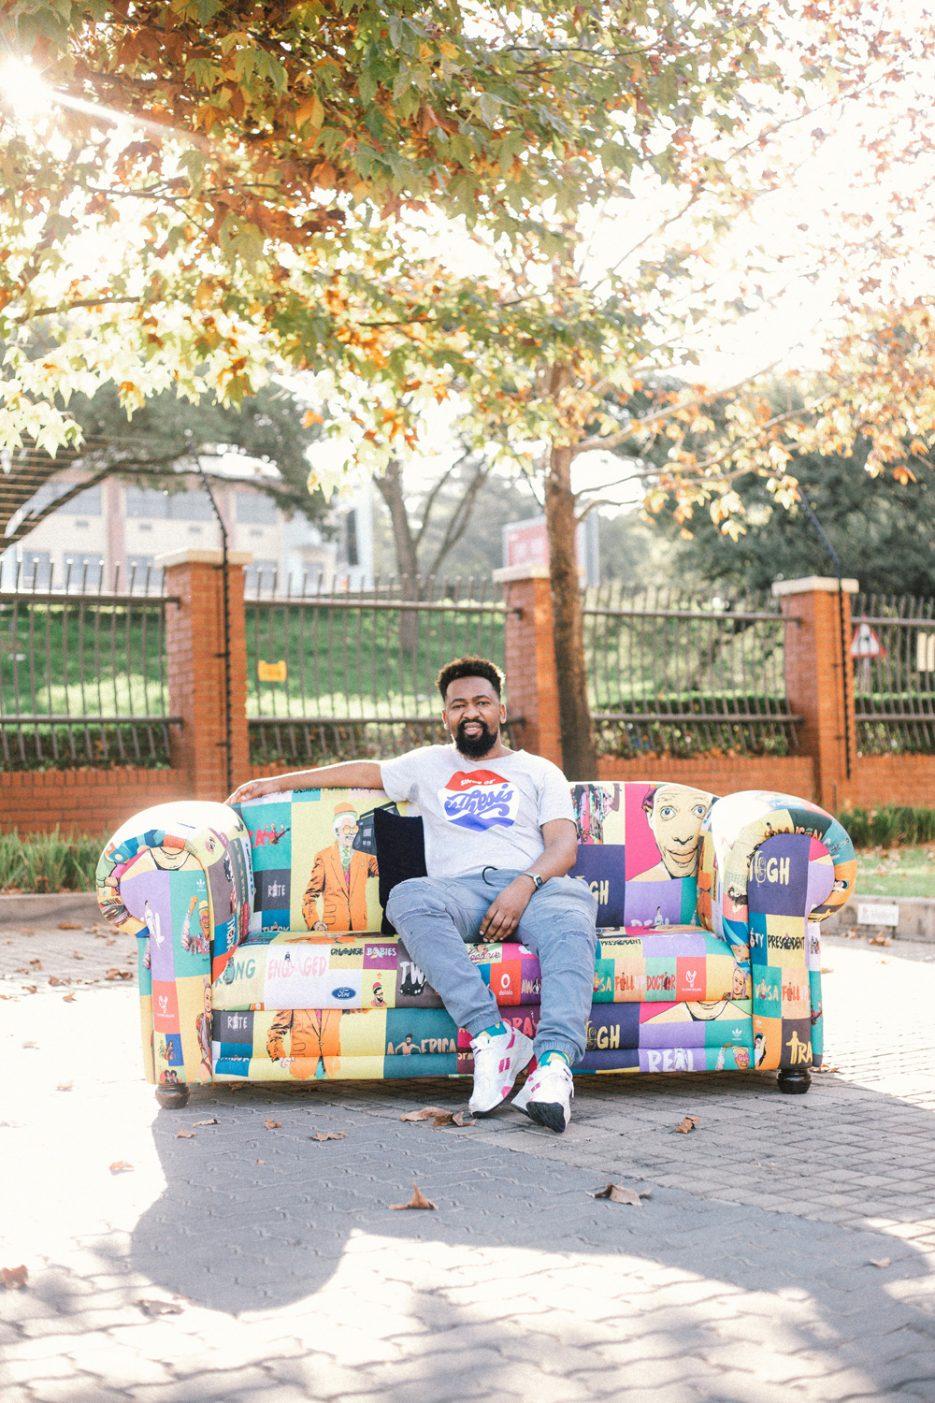 Graphic designer and illustrator David Tshabalala on a couch he designed. Image by Khotso Tsagaane.